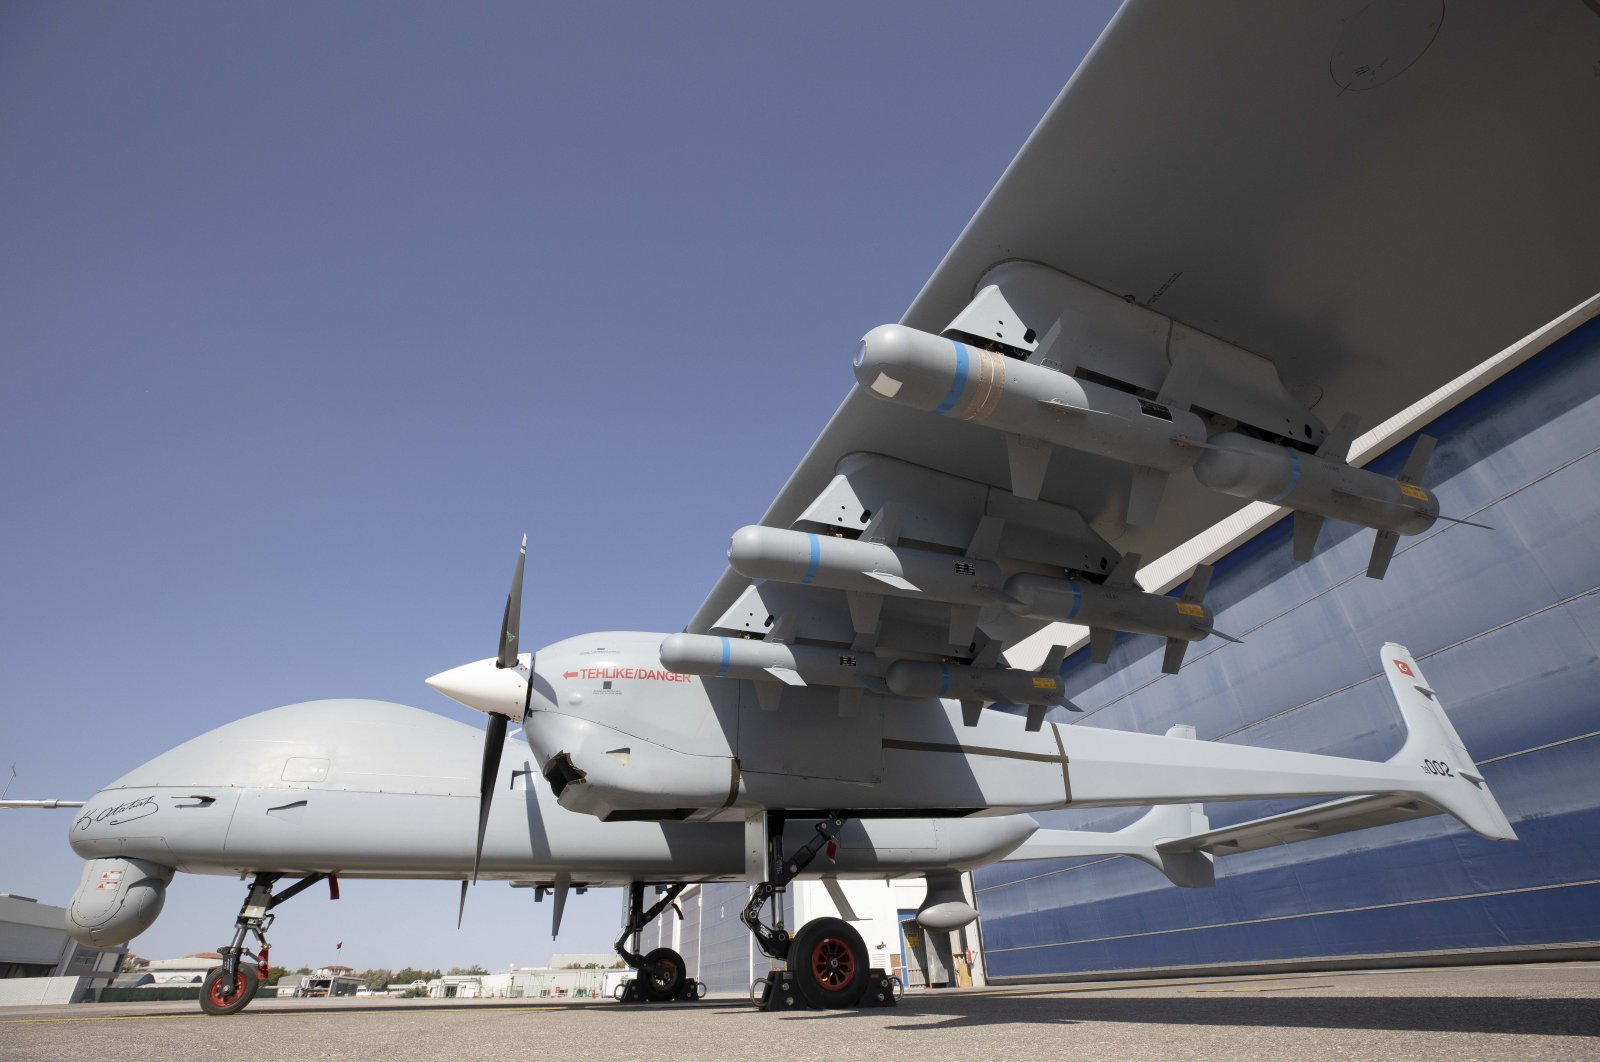 The Aksungur UAV loaded with 12 MAM-L smart ammunitions, Ankara, Turkey, Sept. 17, 2020. (Photo by TAI via AA)